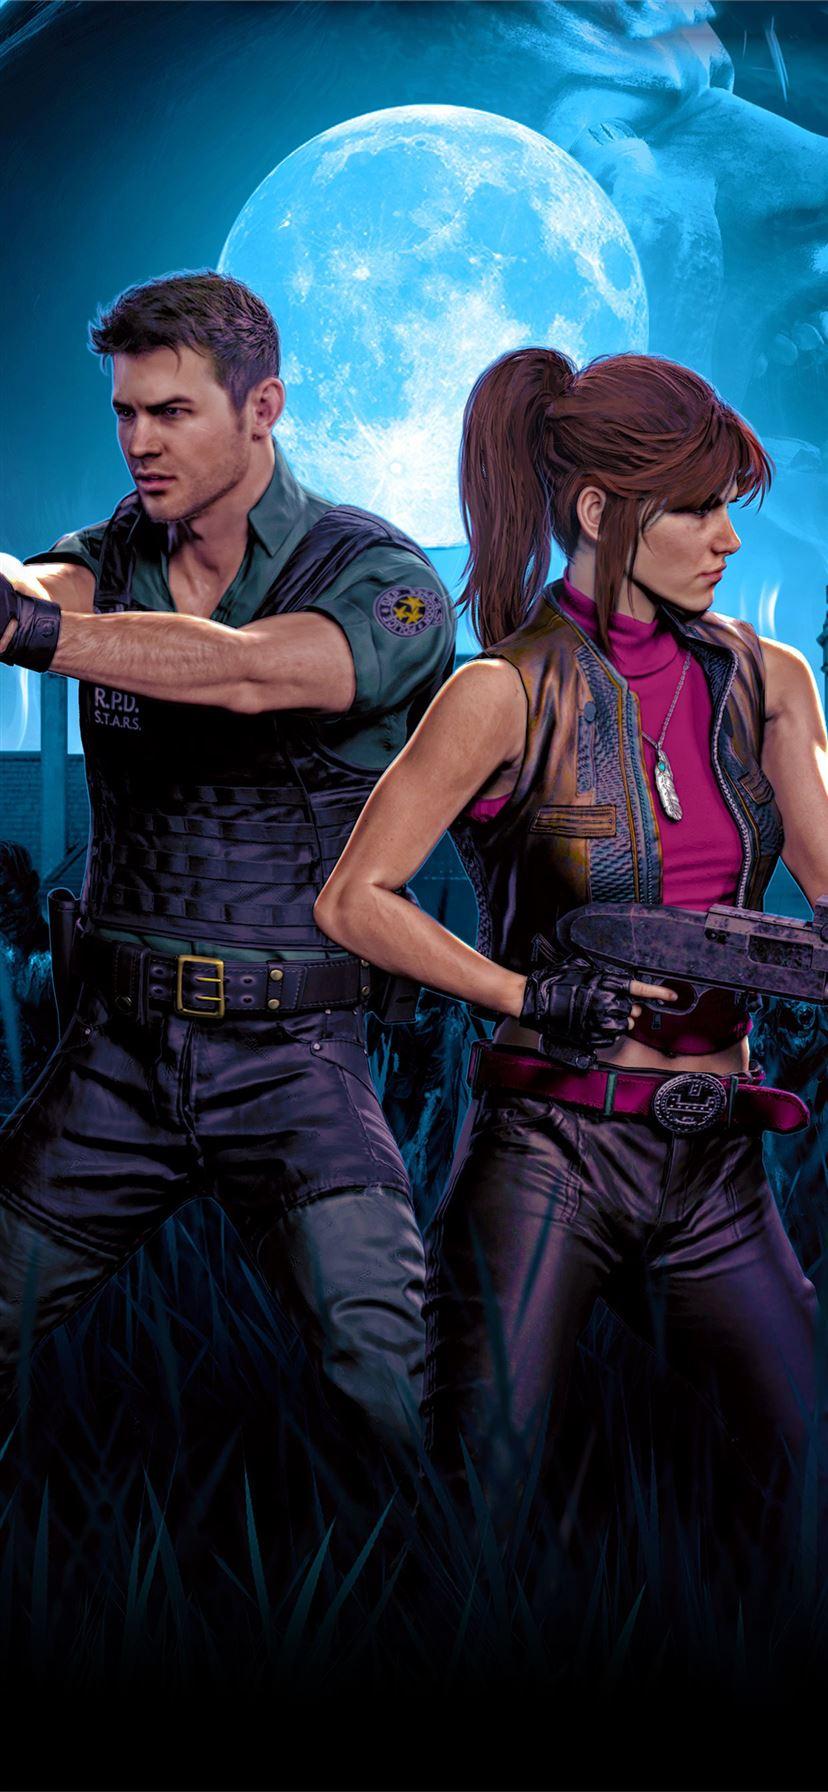 Best Resident Evil 3 Iphone 11 Wallpapers Hd Ilikewallpaper